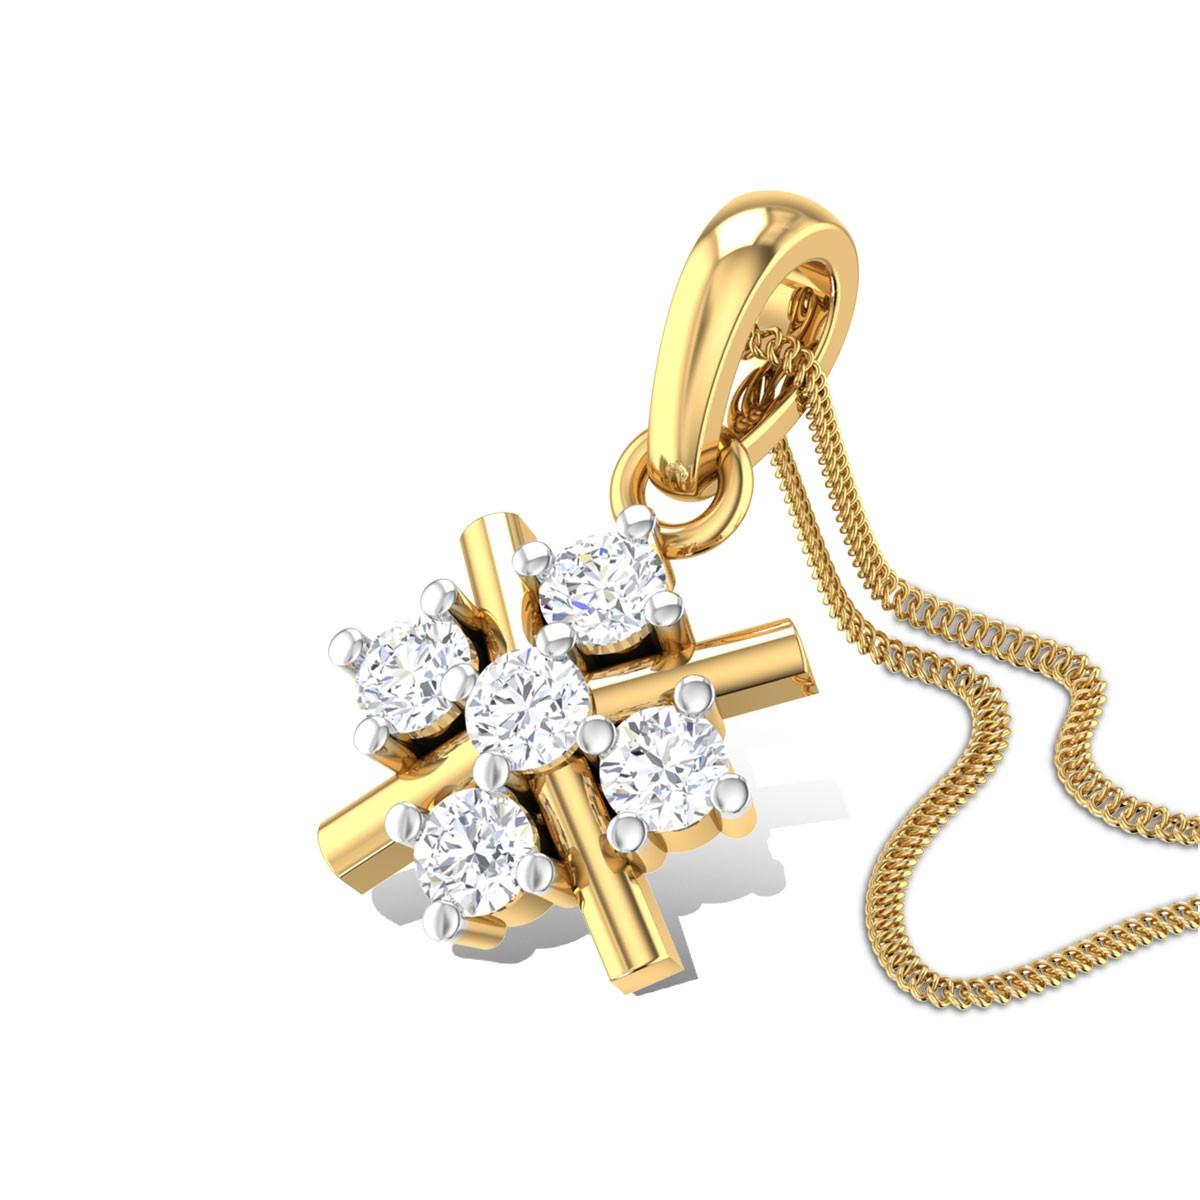 Ring of Hearts Diamond Pendant